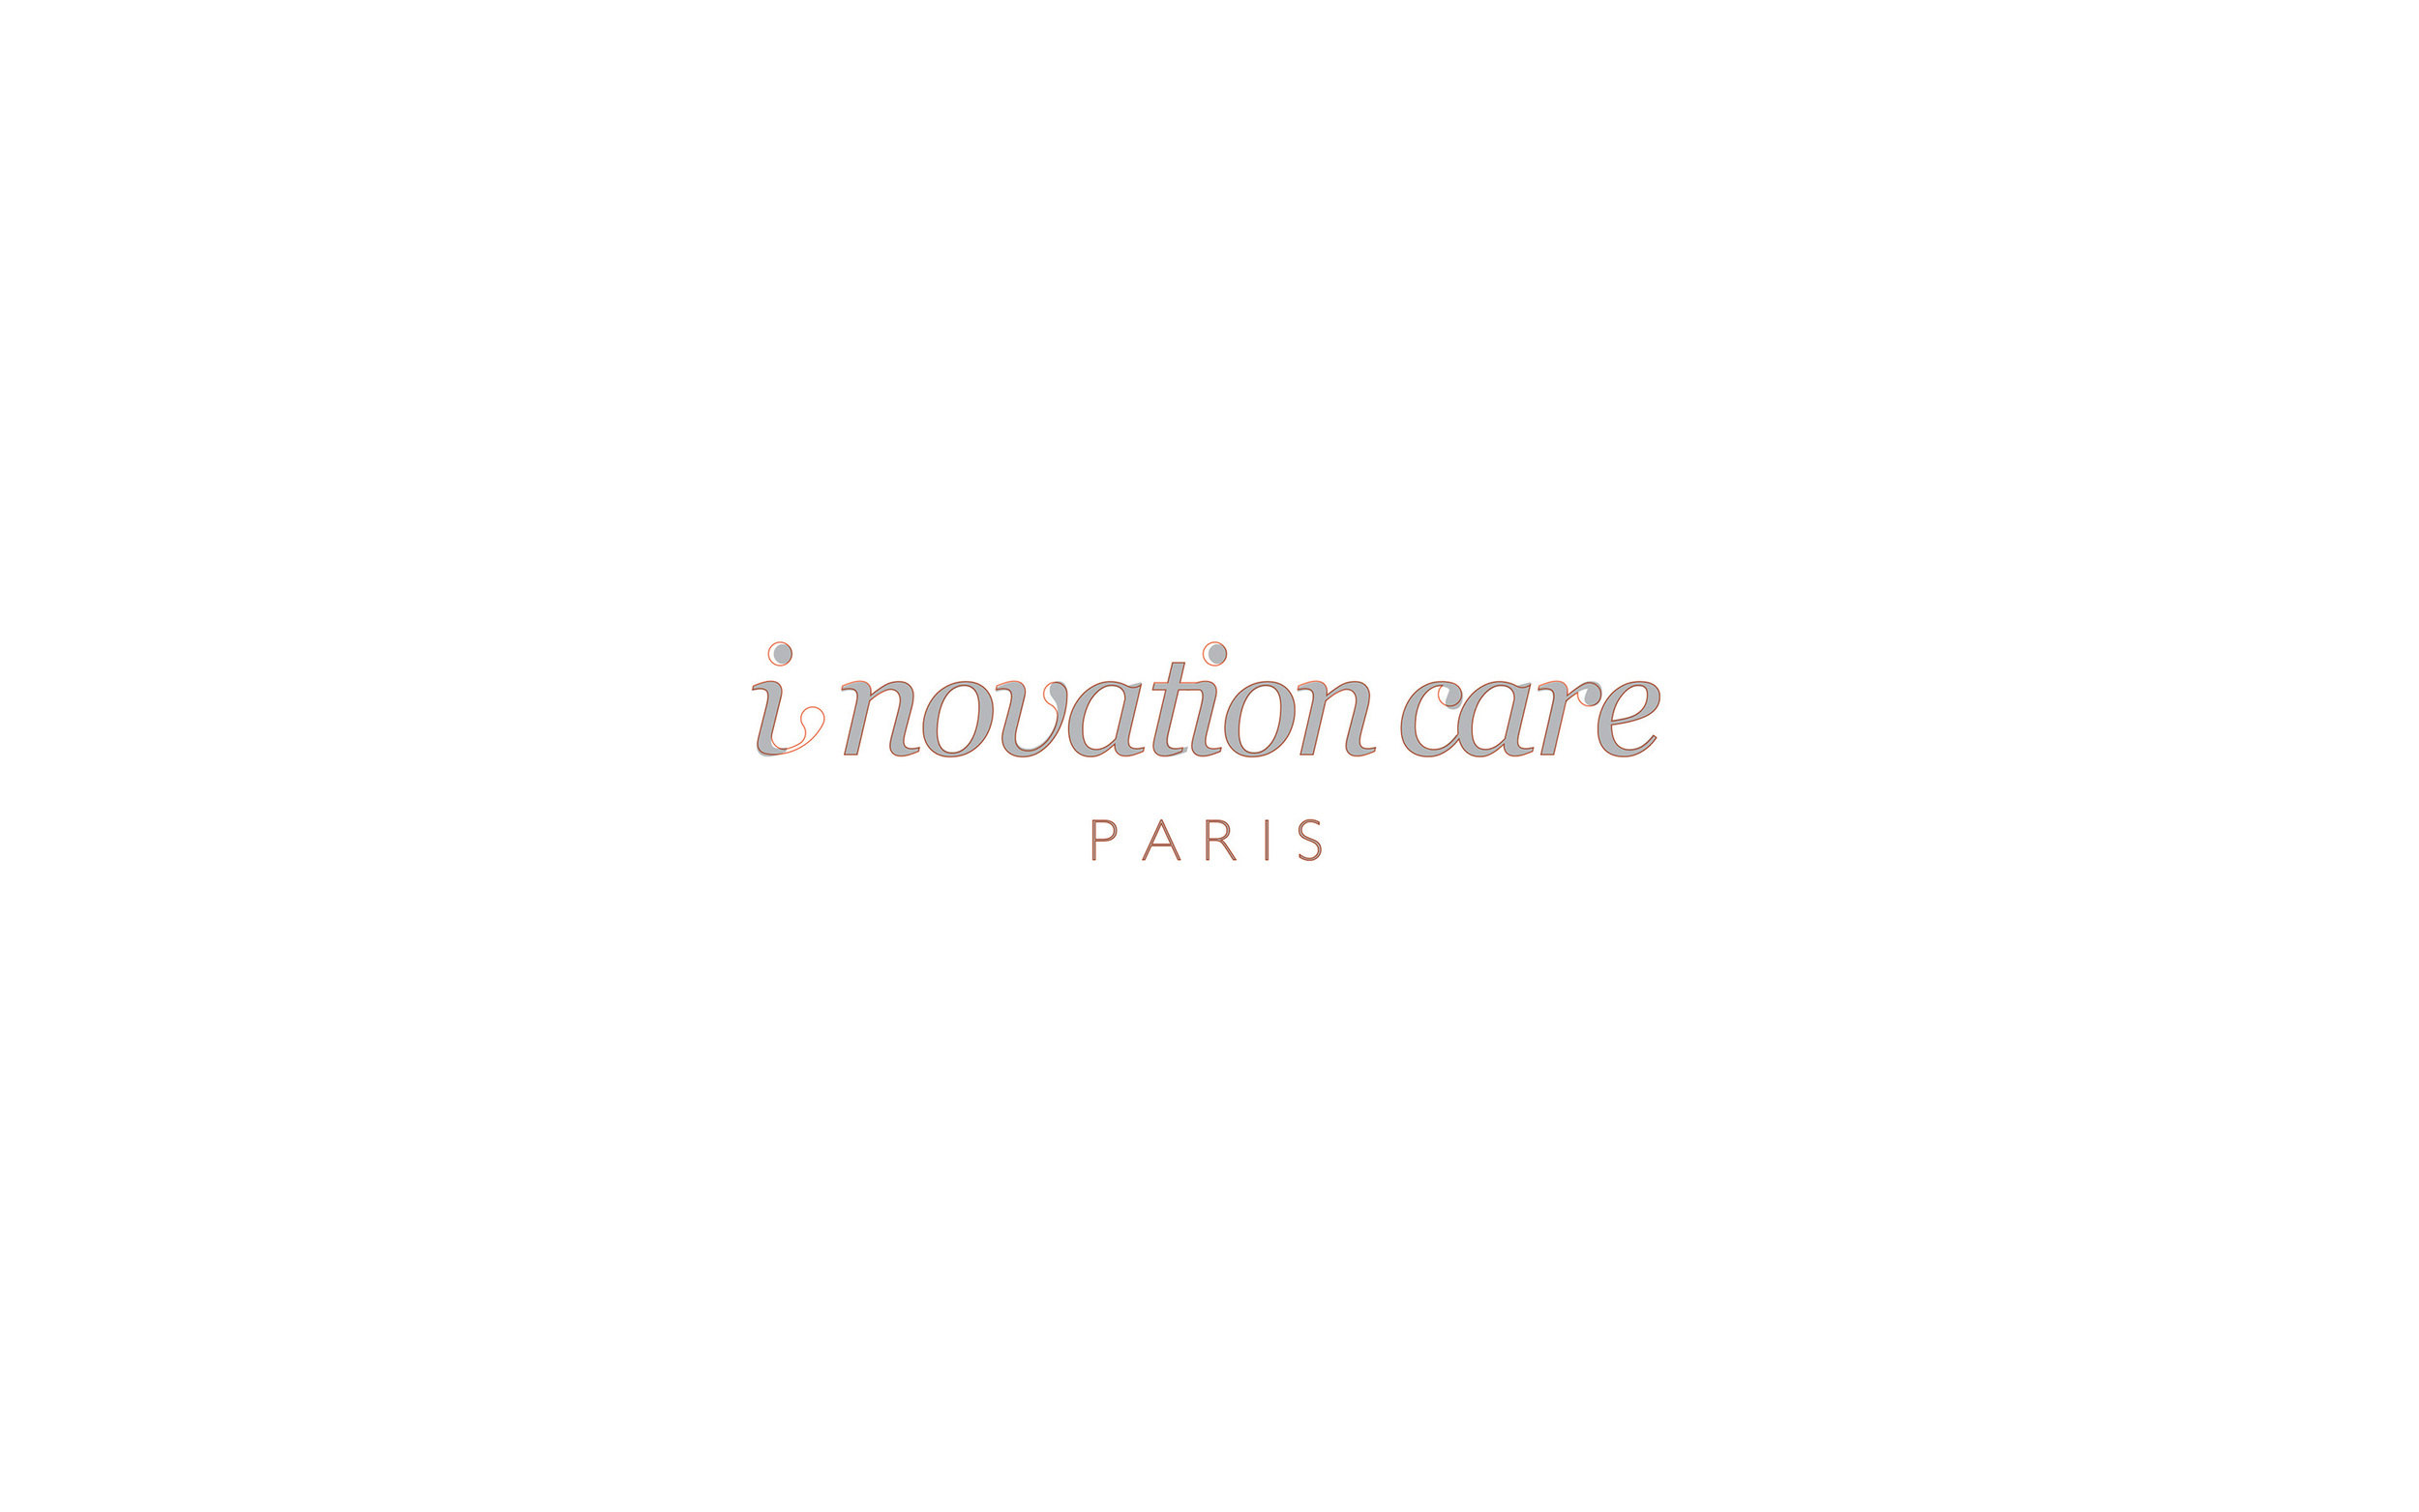 inovationcare-design-childer-03.jpg